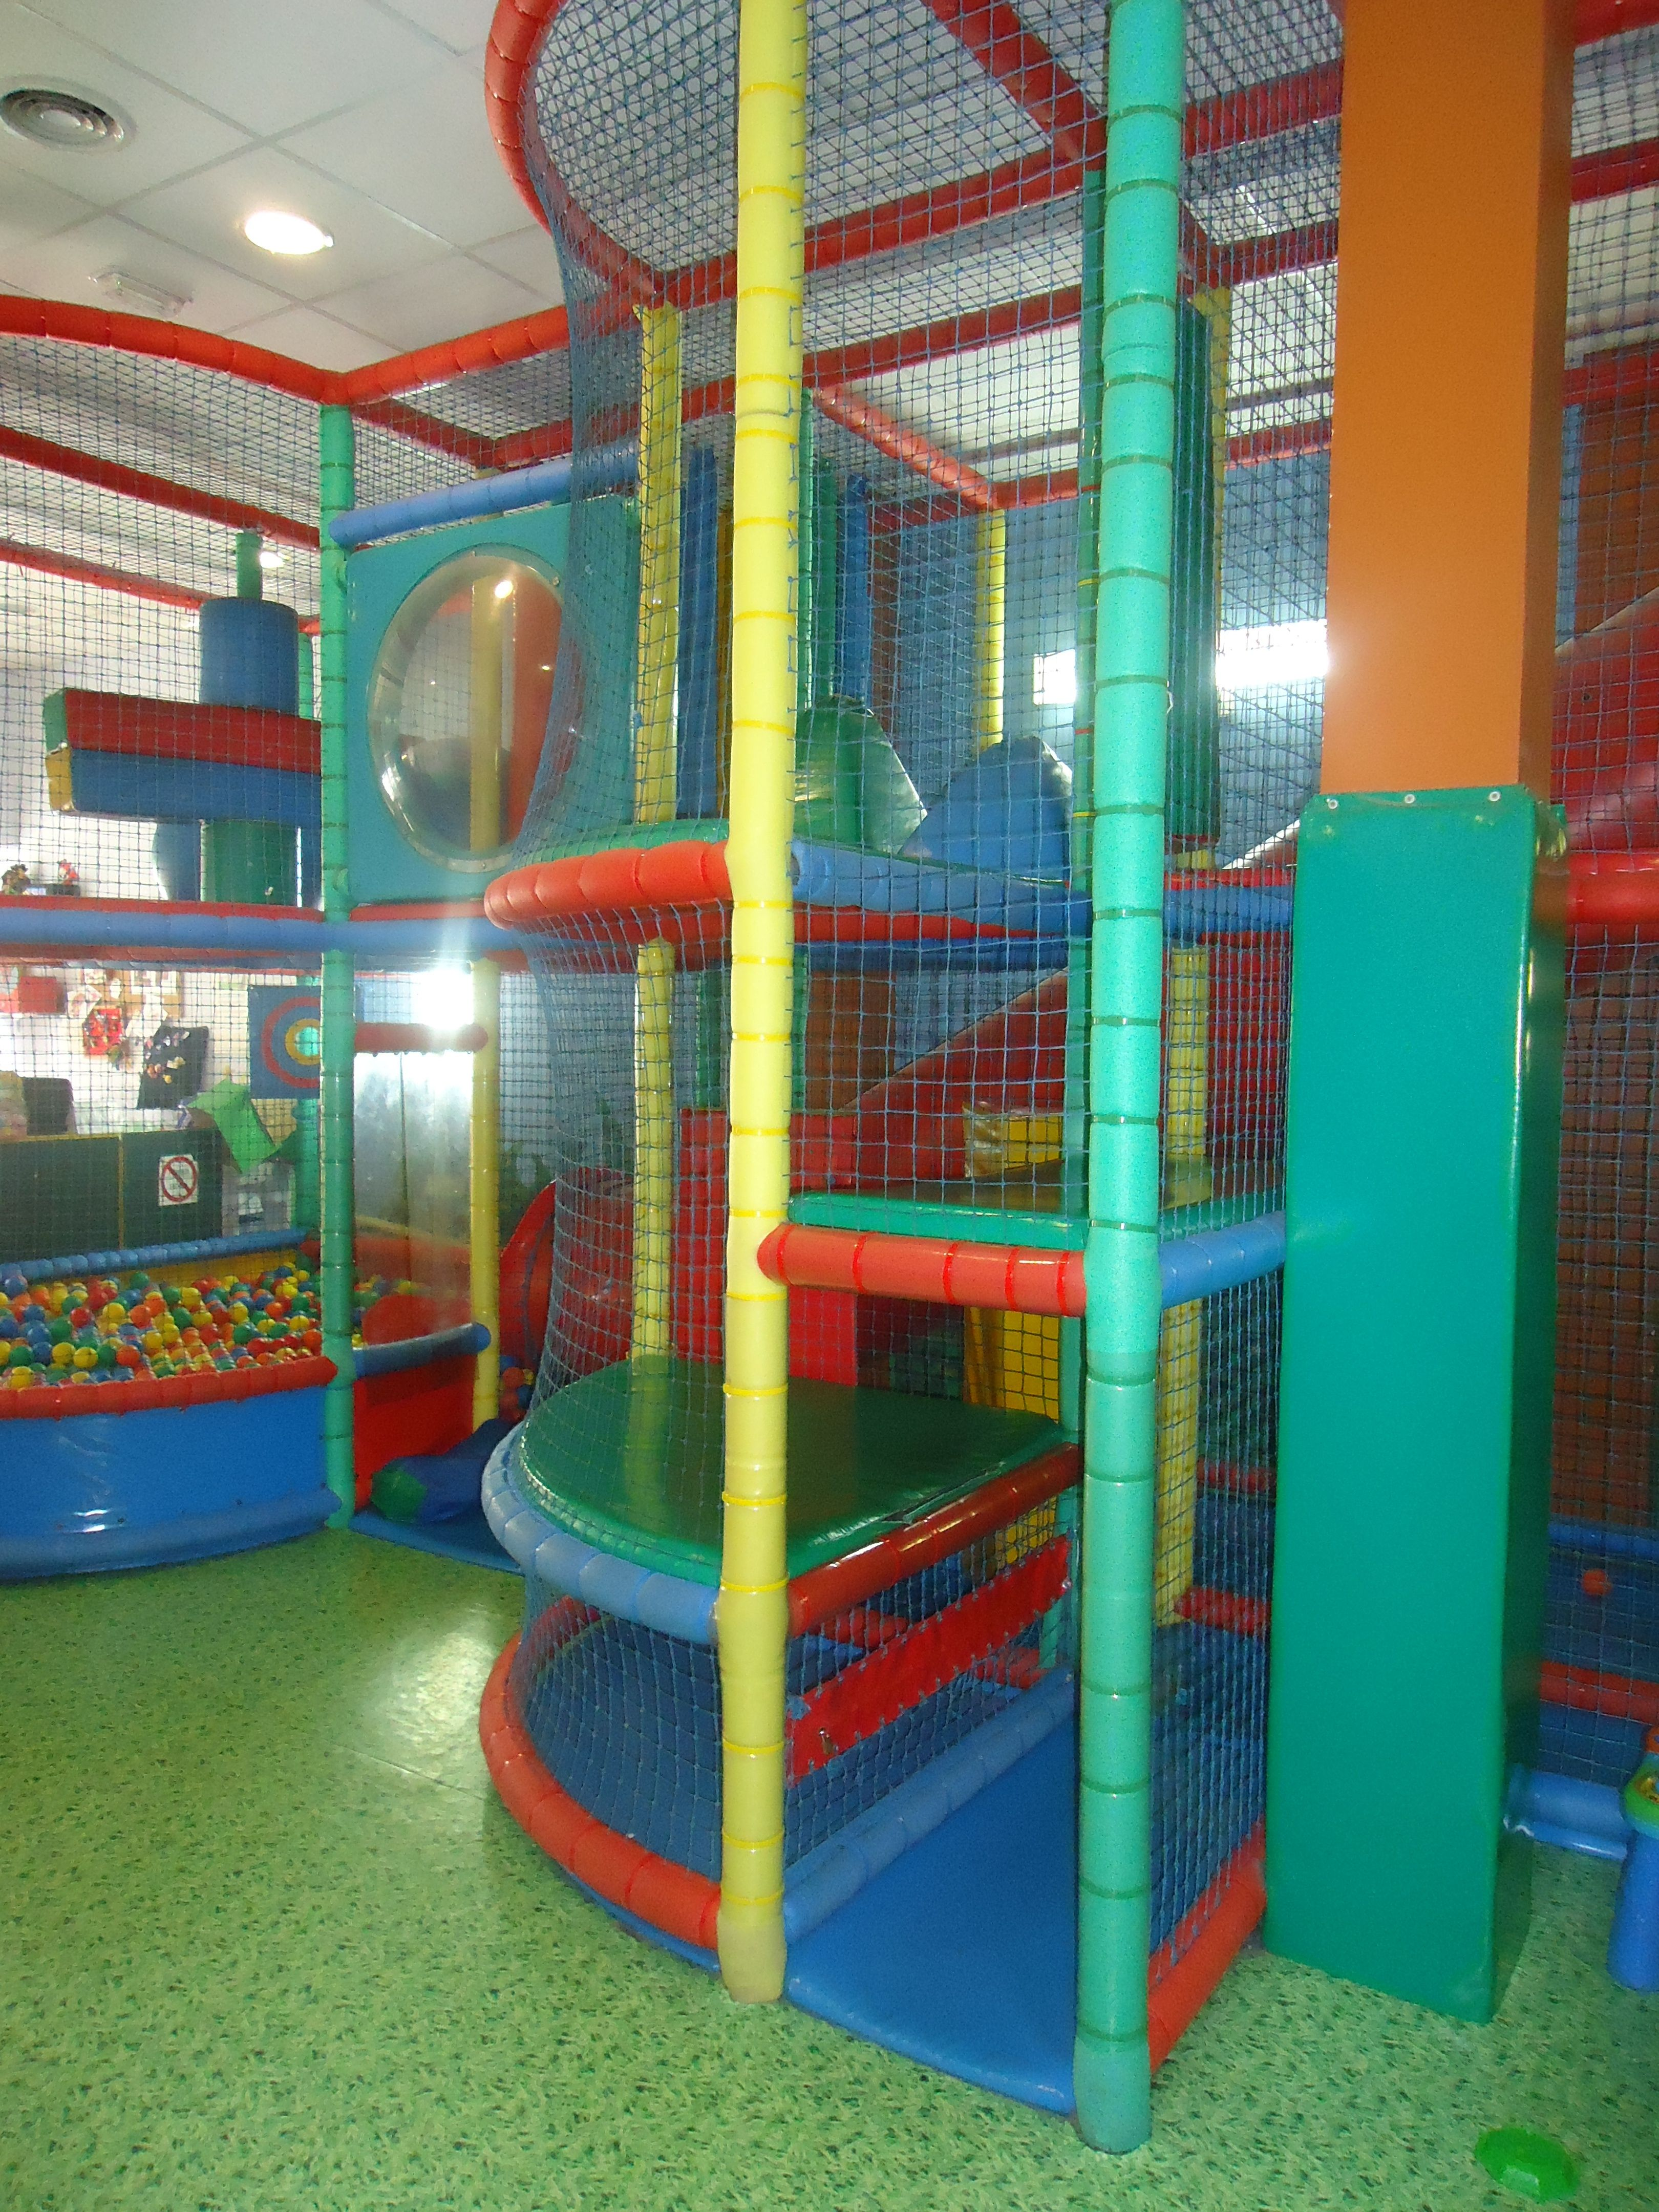 Foto 15 de Parques infantiles en Móstoles | Gnomos y Hobbits